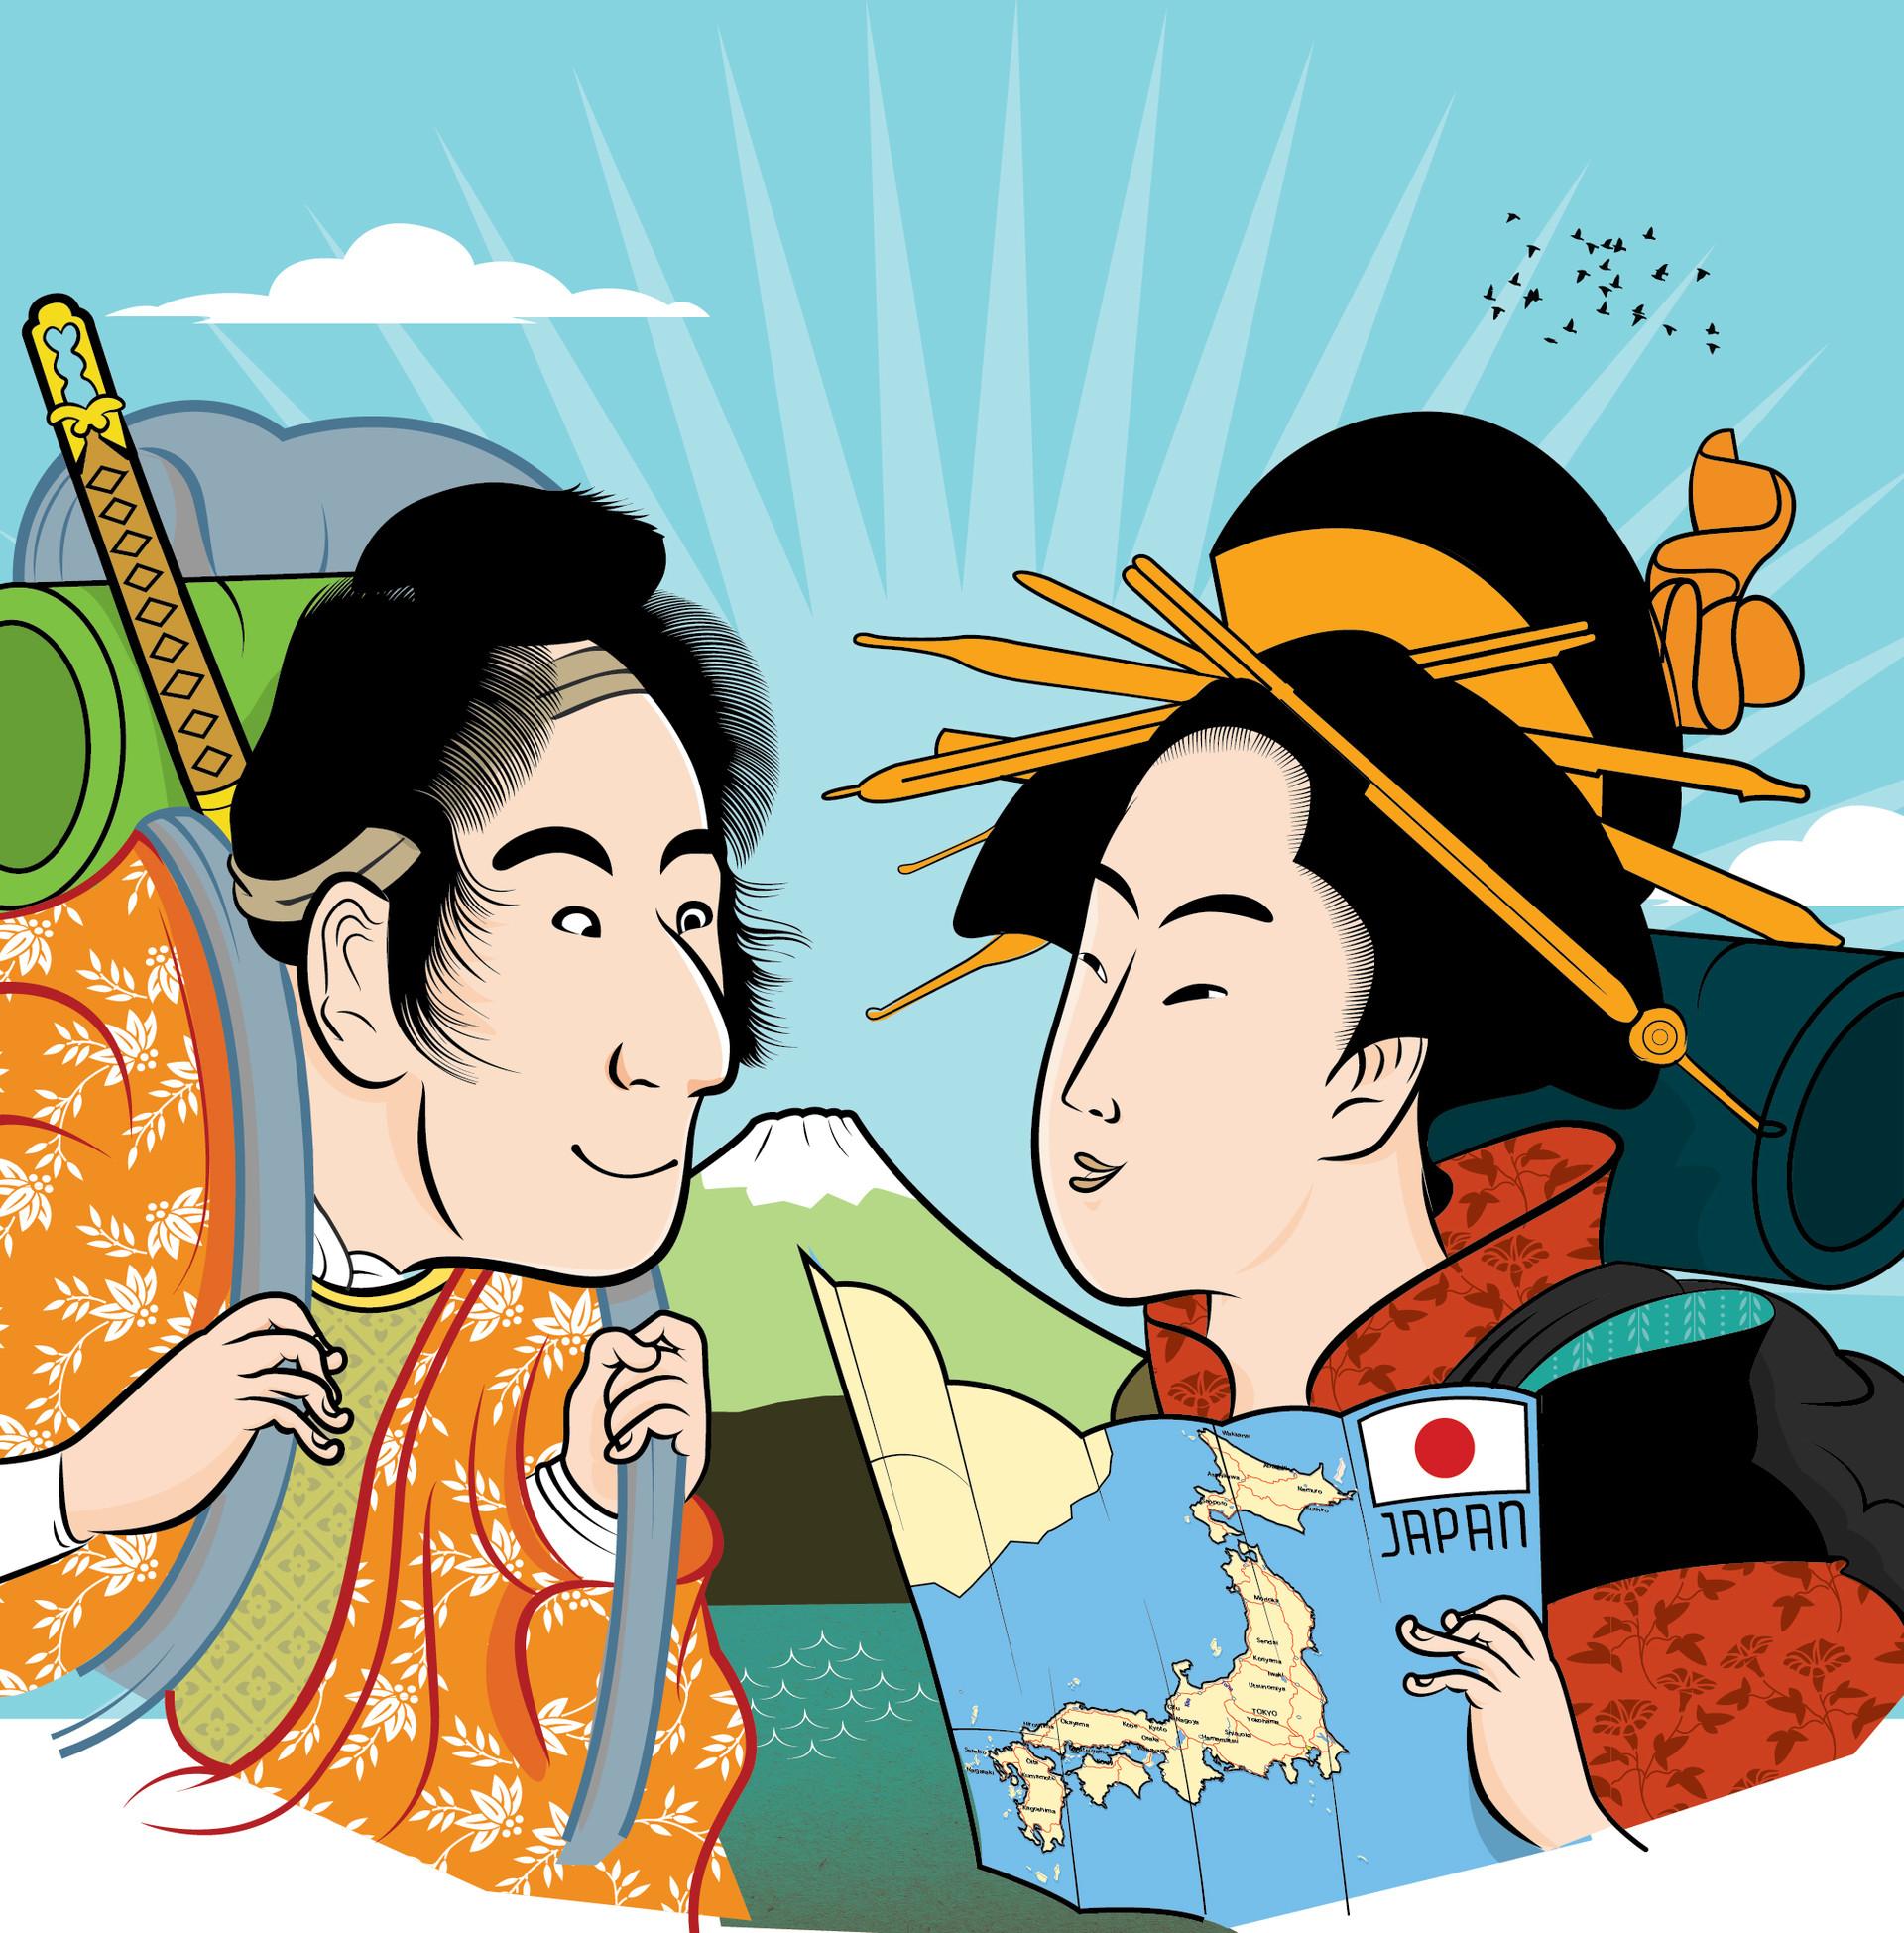 Marco baccioli fukuoka illustration v2 01